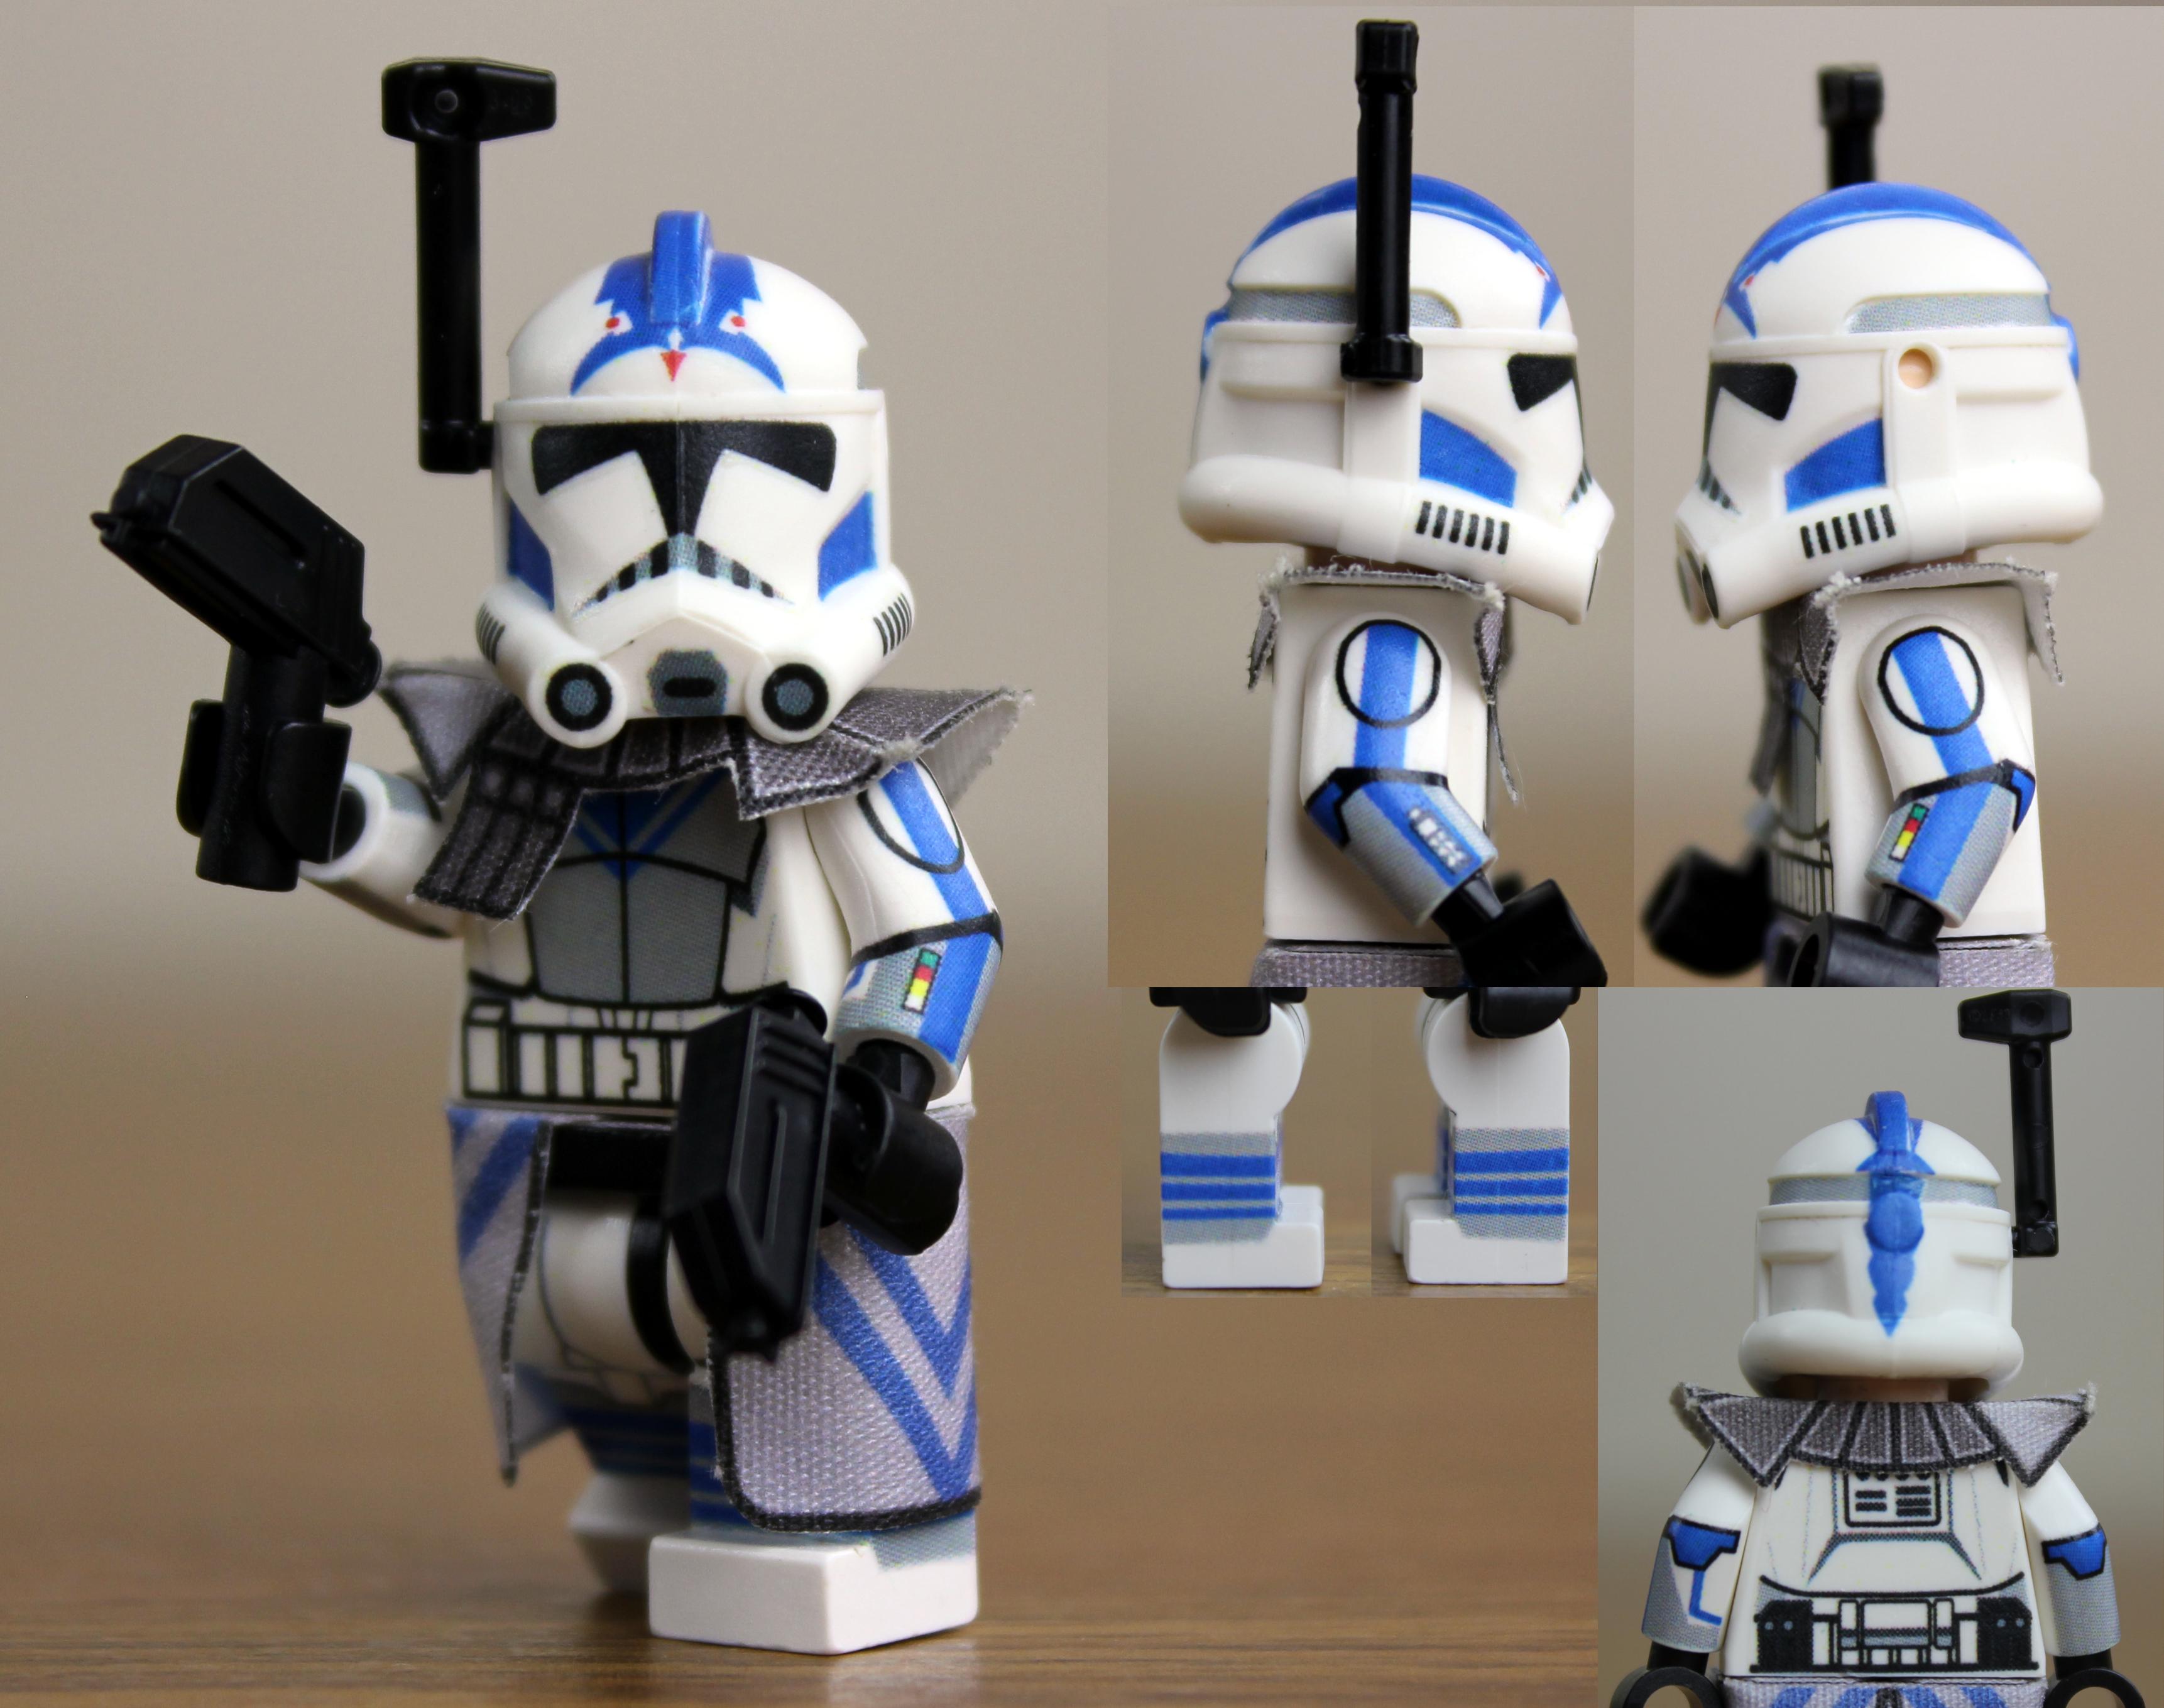 Fives Arc Trooper Lego Sets Custom Lego Arc Trooper Fives